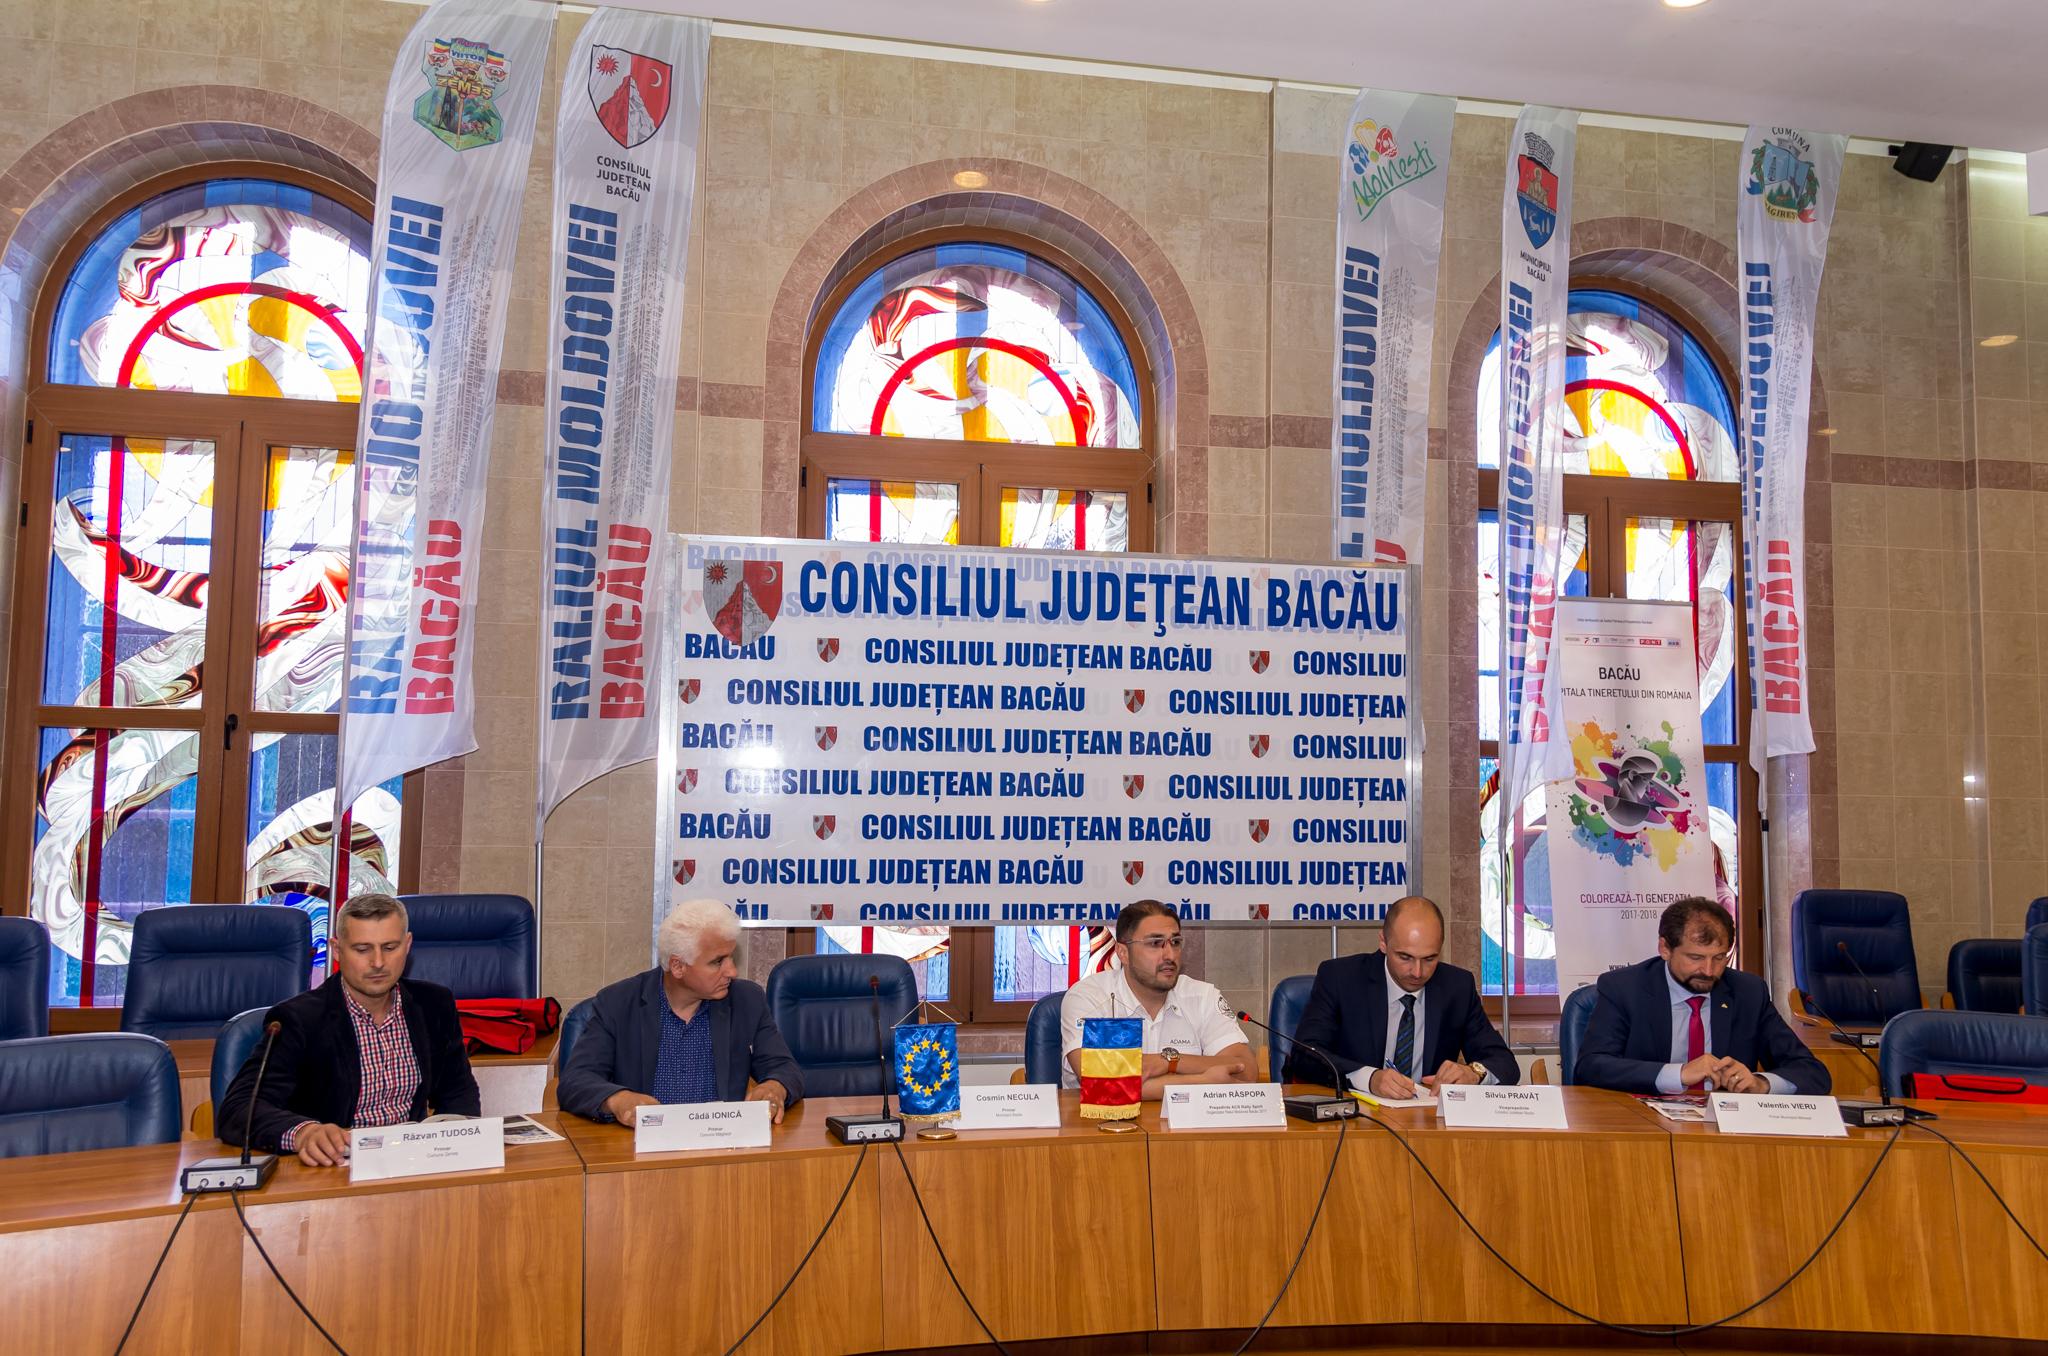 CONFERINTA DE PRESA PREMERGATOARE RALIULUI MOLDOVEI BACAU 2017